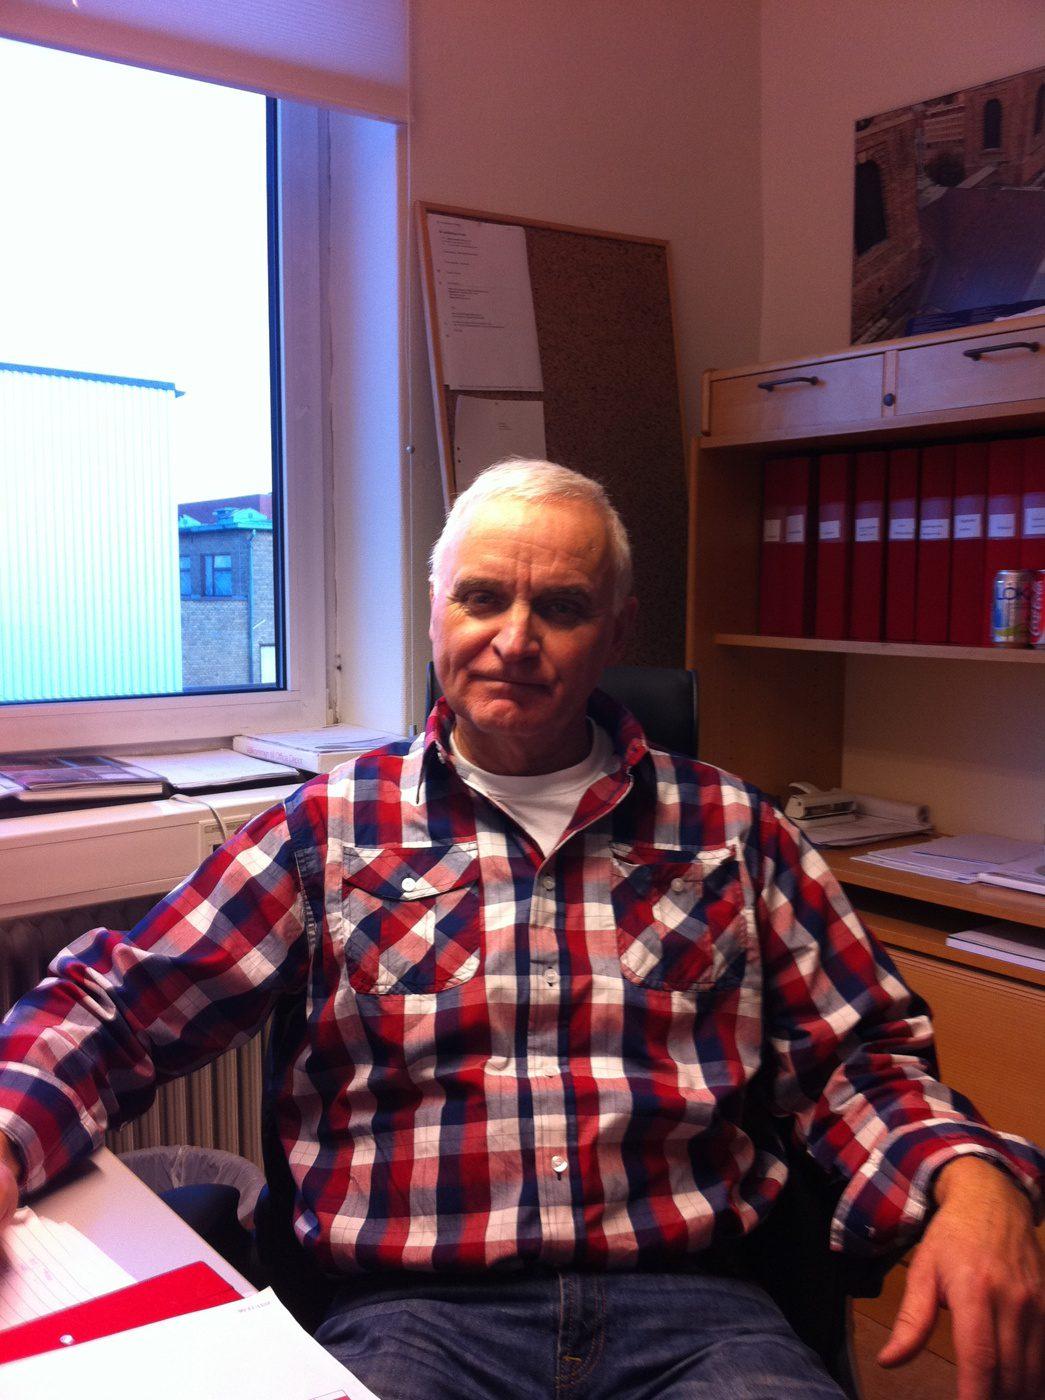 Sven-Olof Svensson